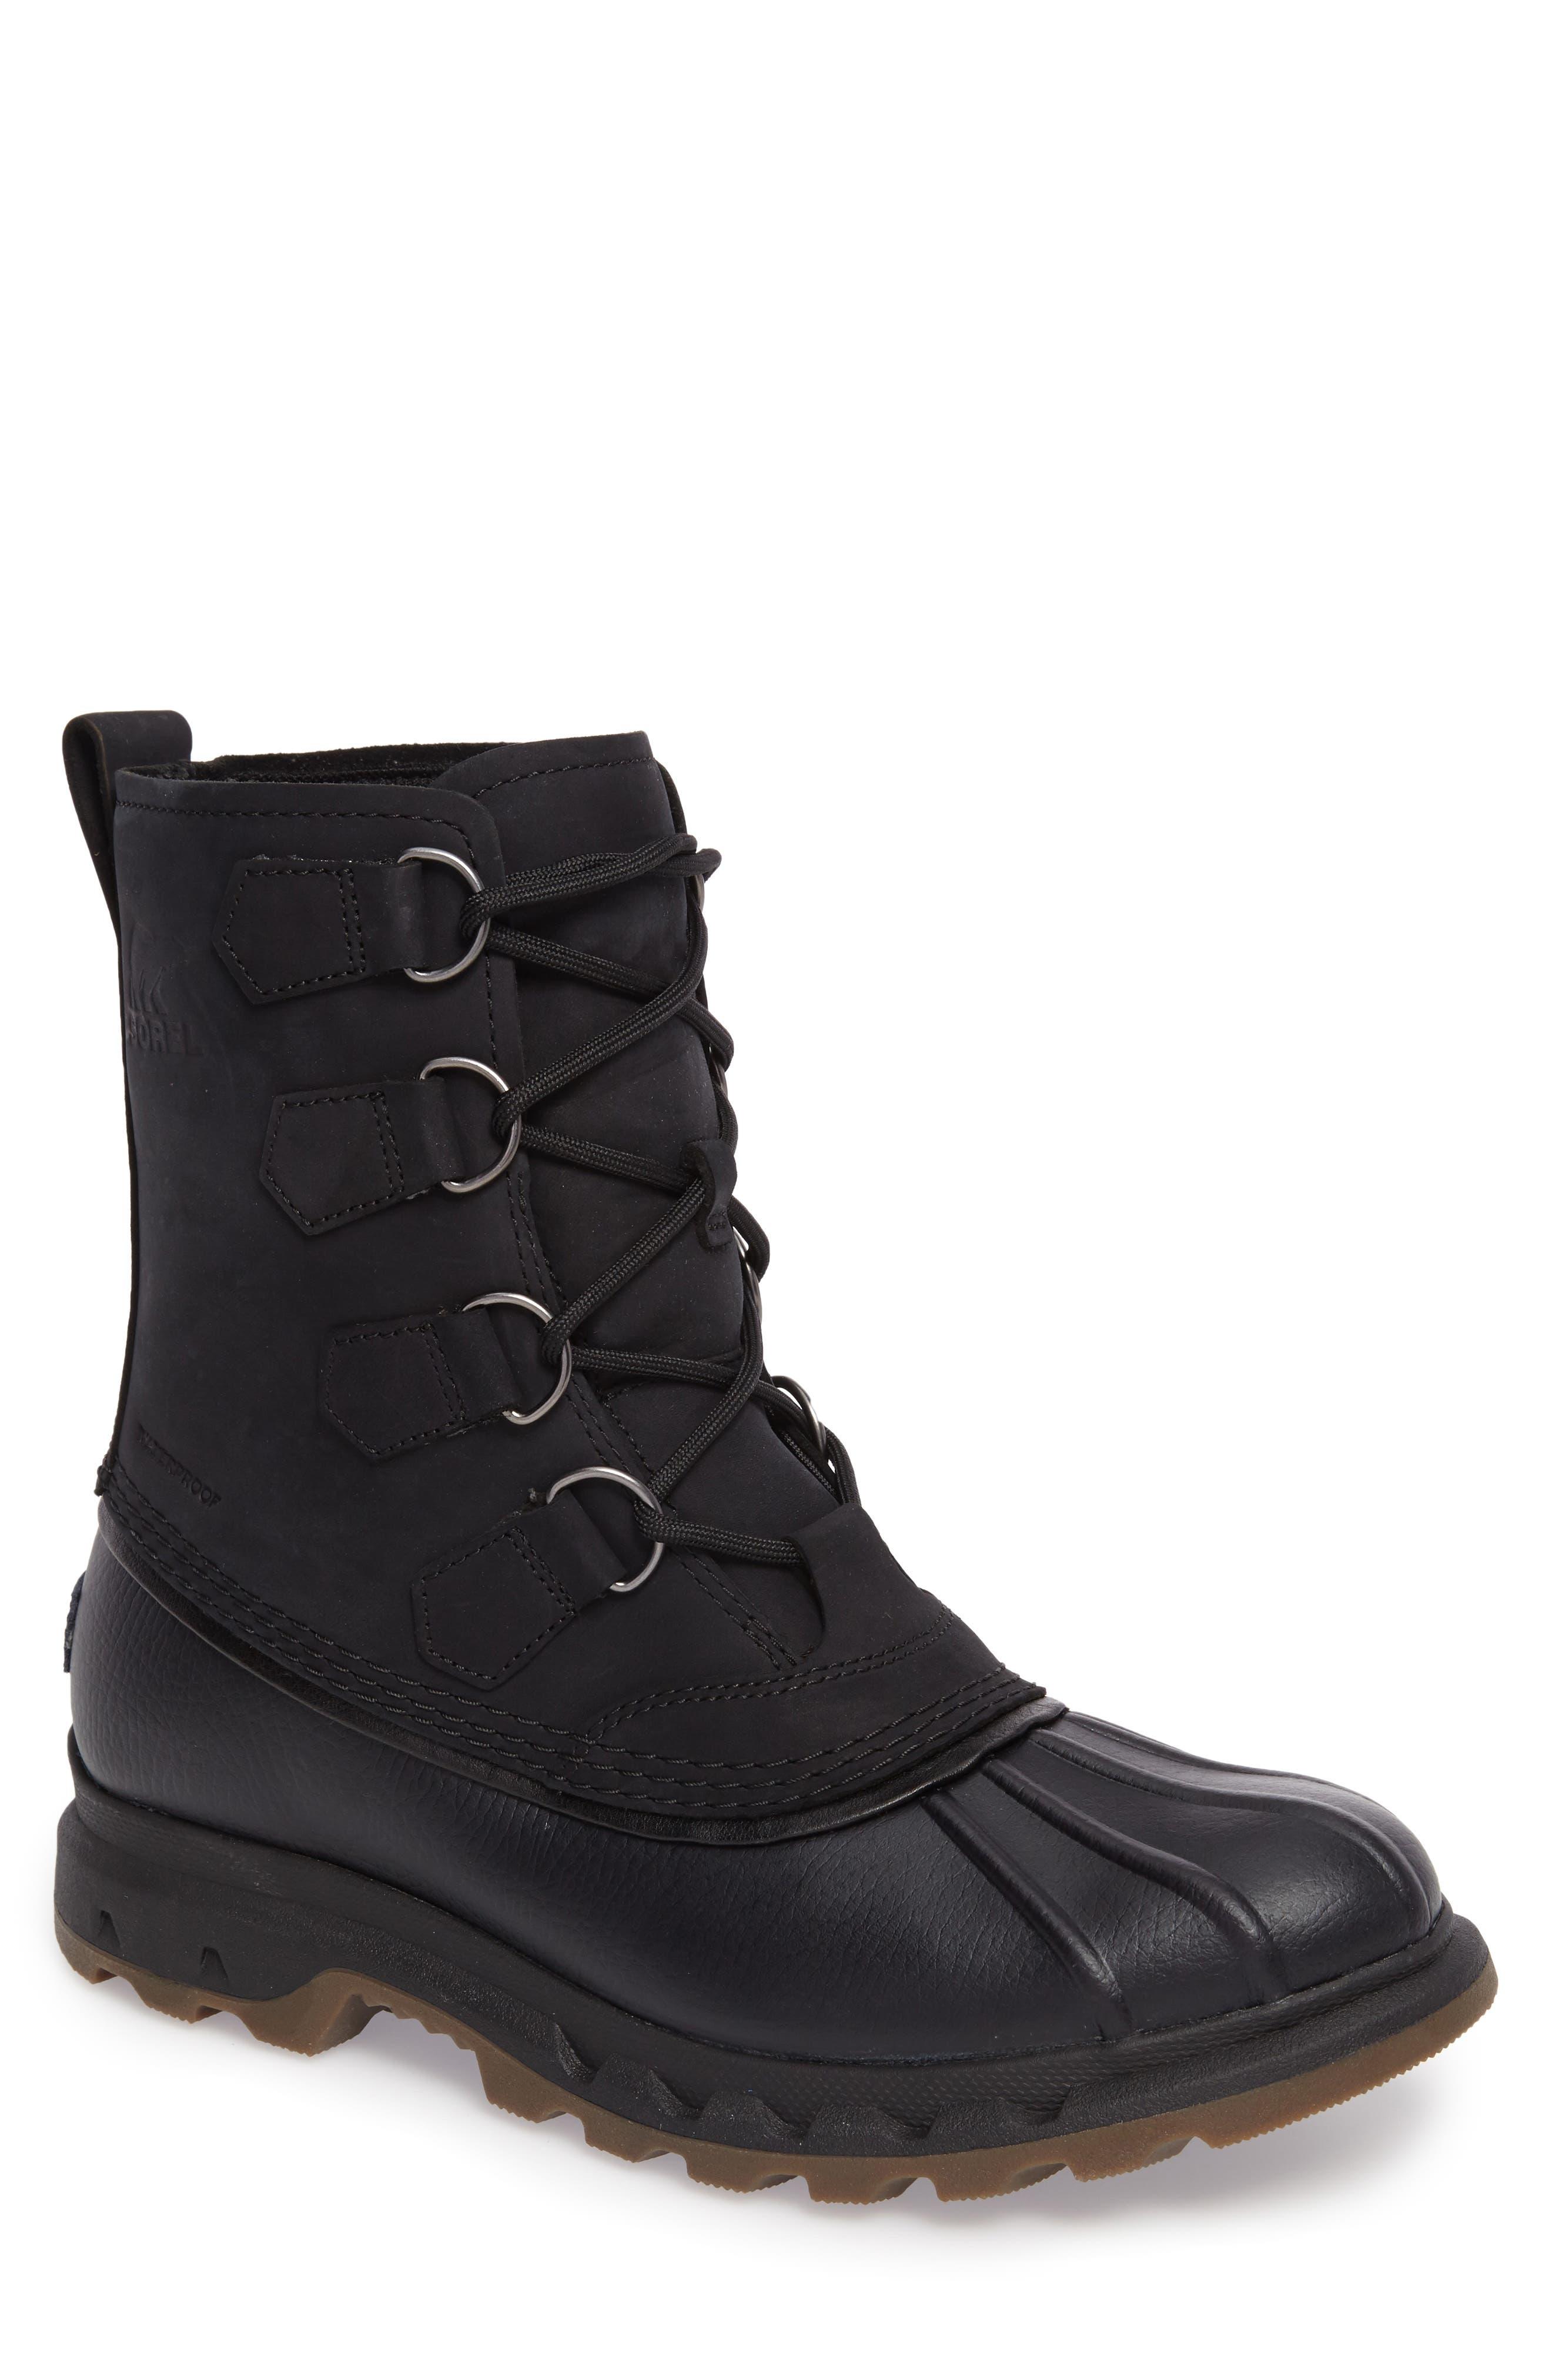 Portzman Classic Rain Boot,                         Main,                         color, Black